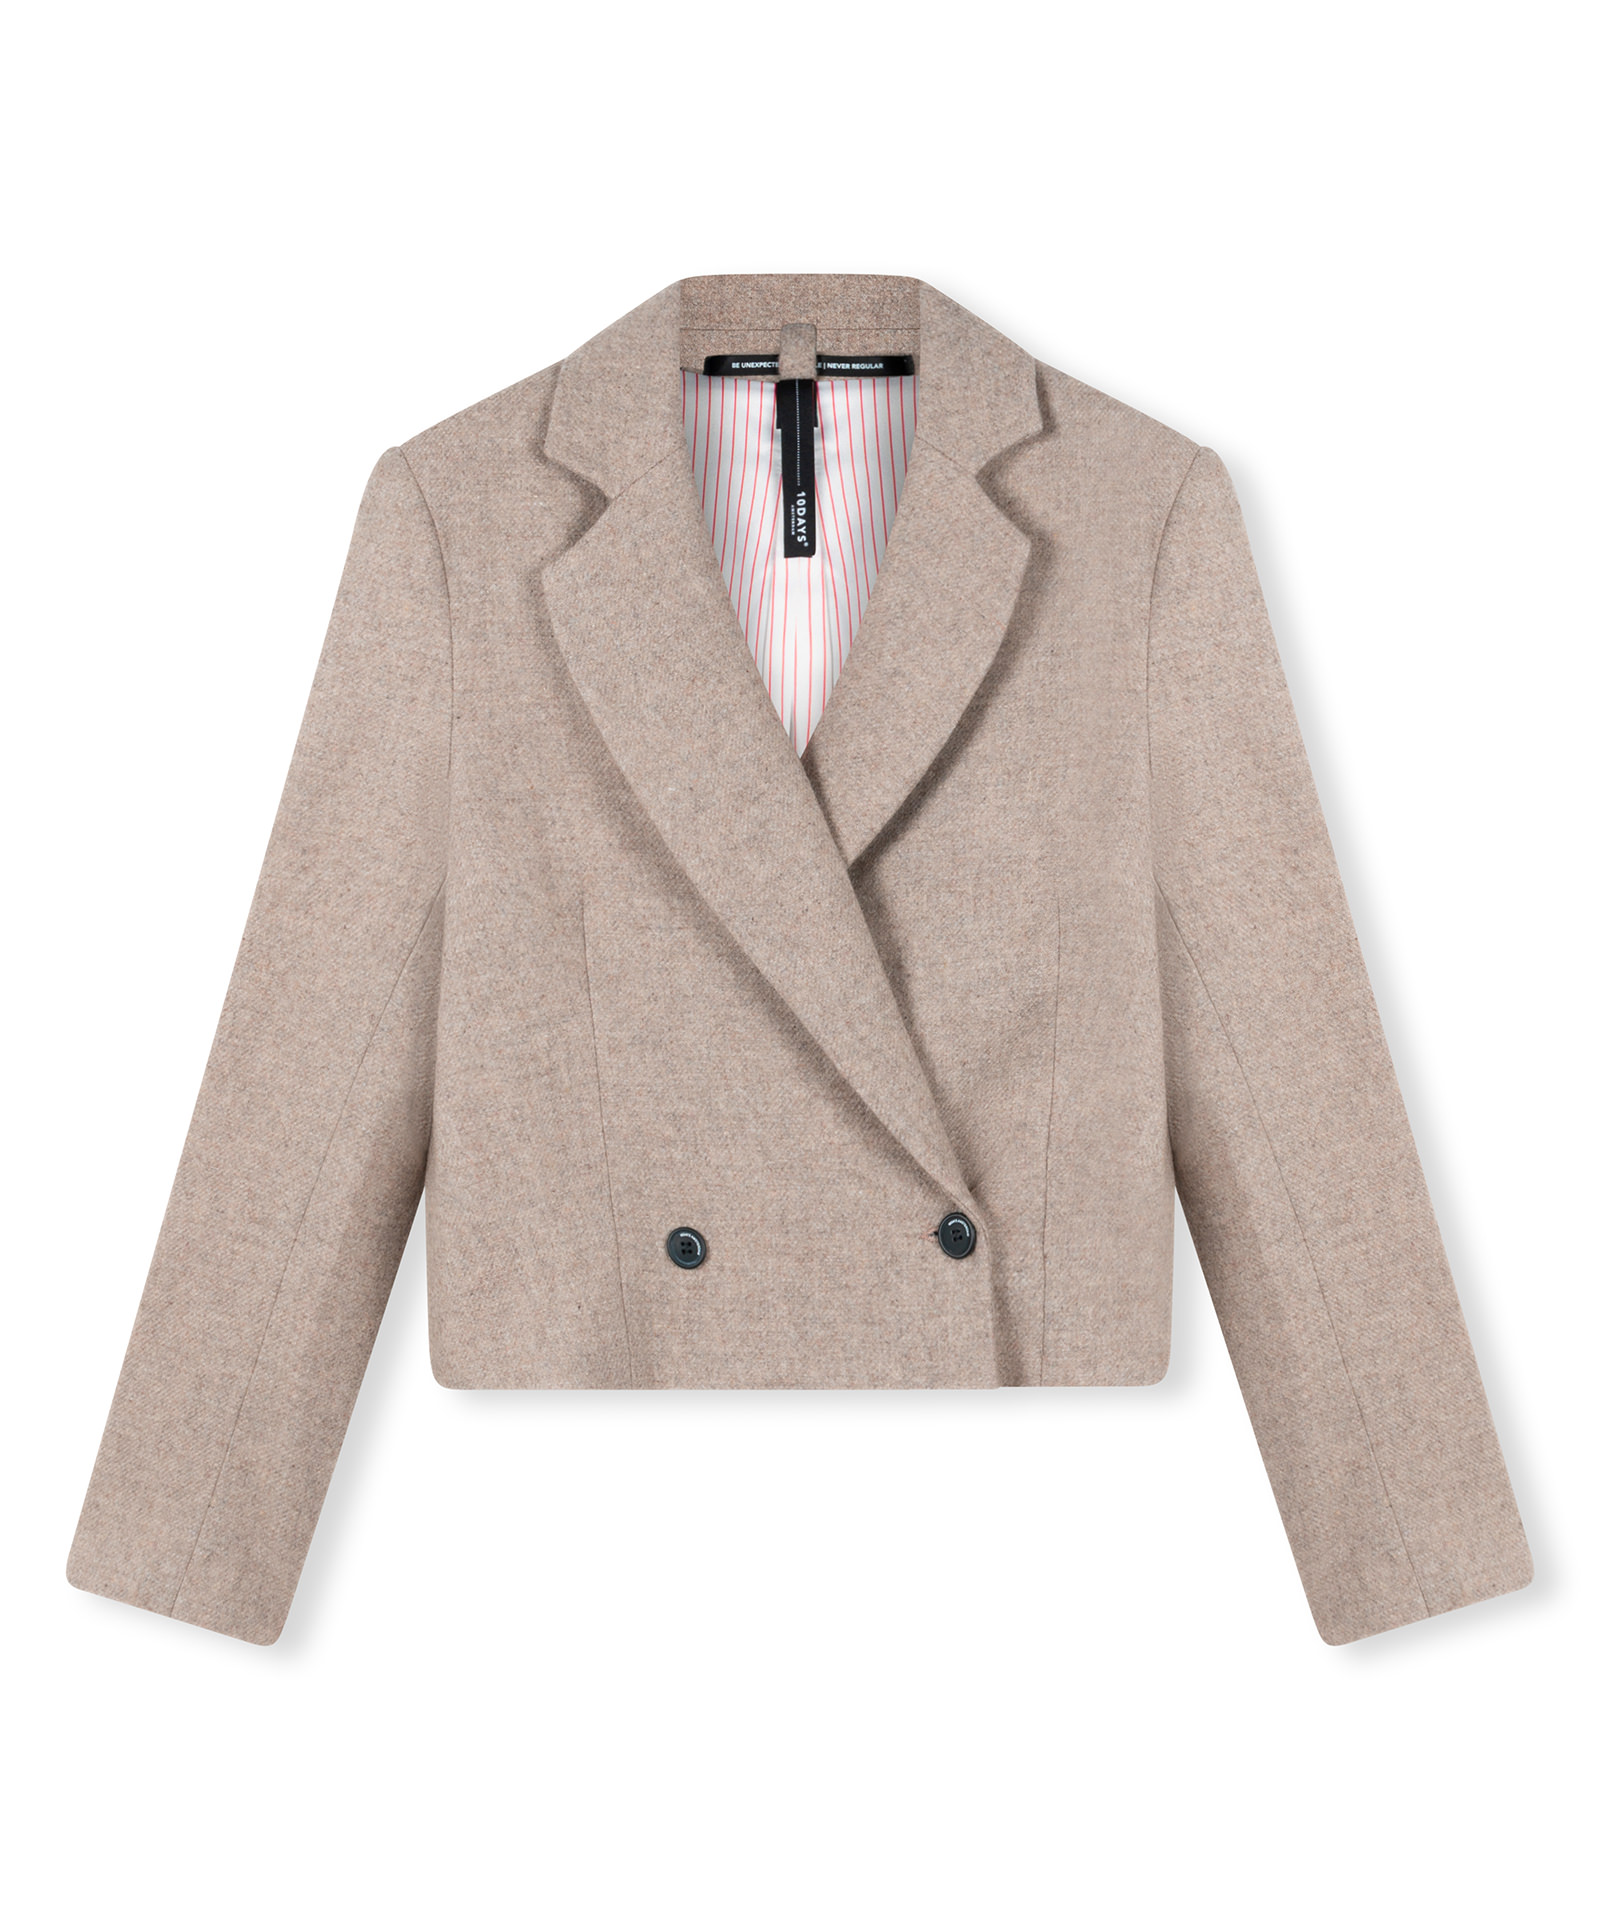 Cropped Wool Blazer - Toppo